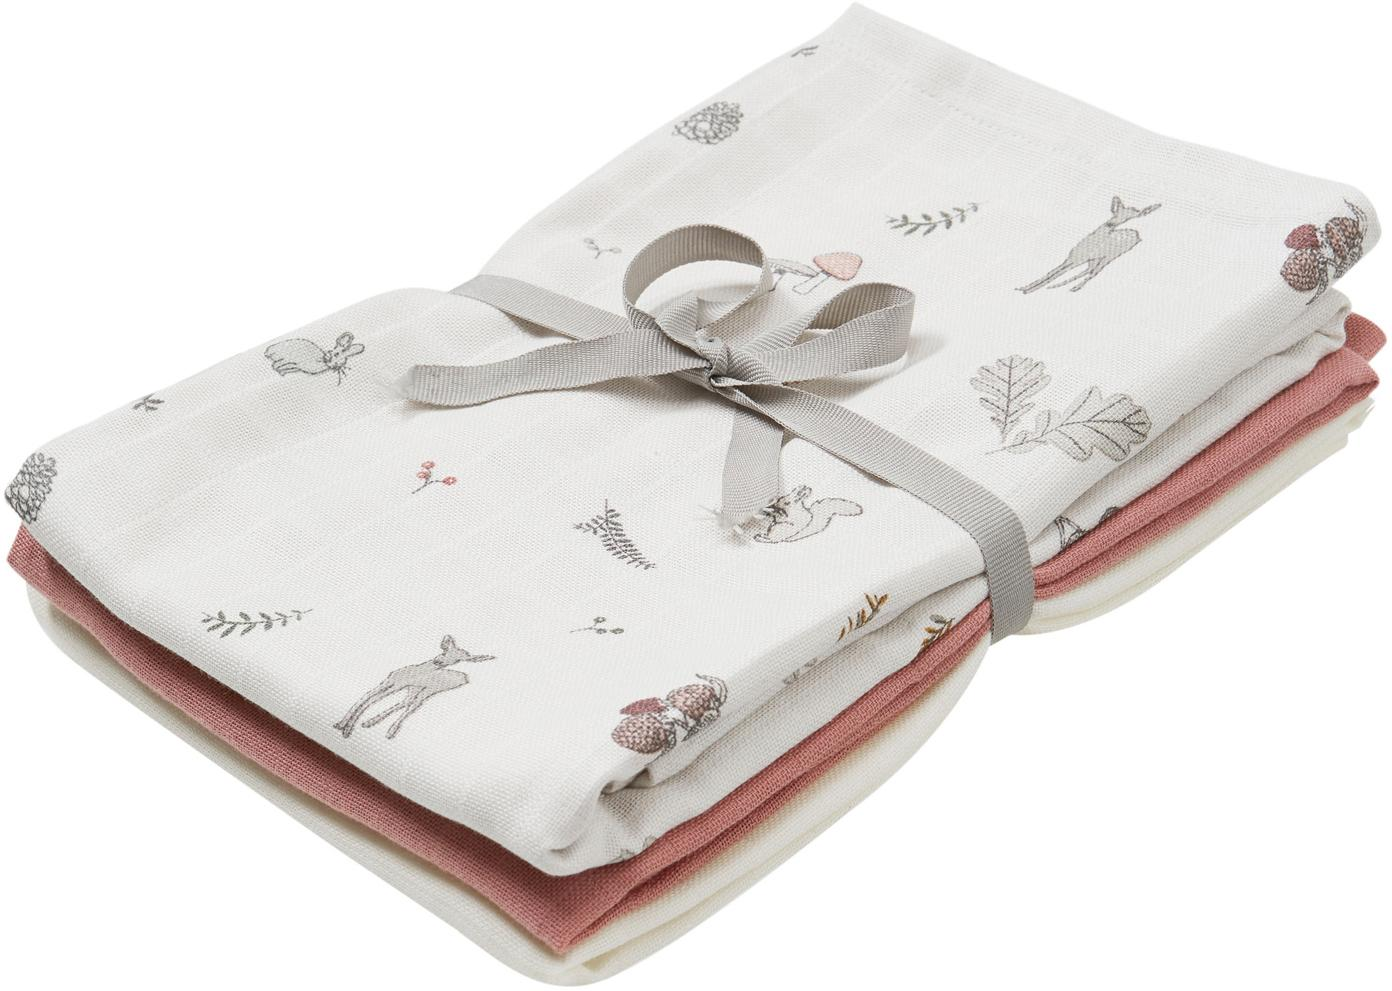 Set de pañales de tela Fawn, 3pzas., Algodón orgánico, Blanco, marrón, beige, amarillo, rosa, verde, An 70 x L 70 cm